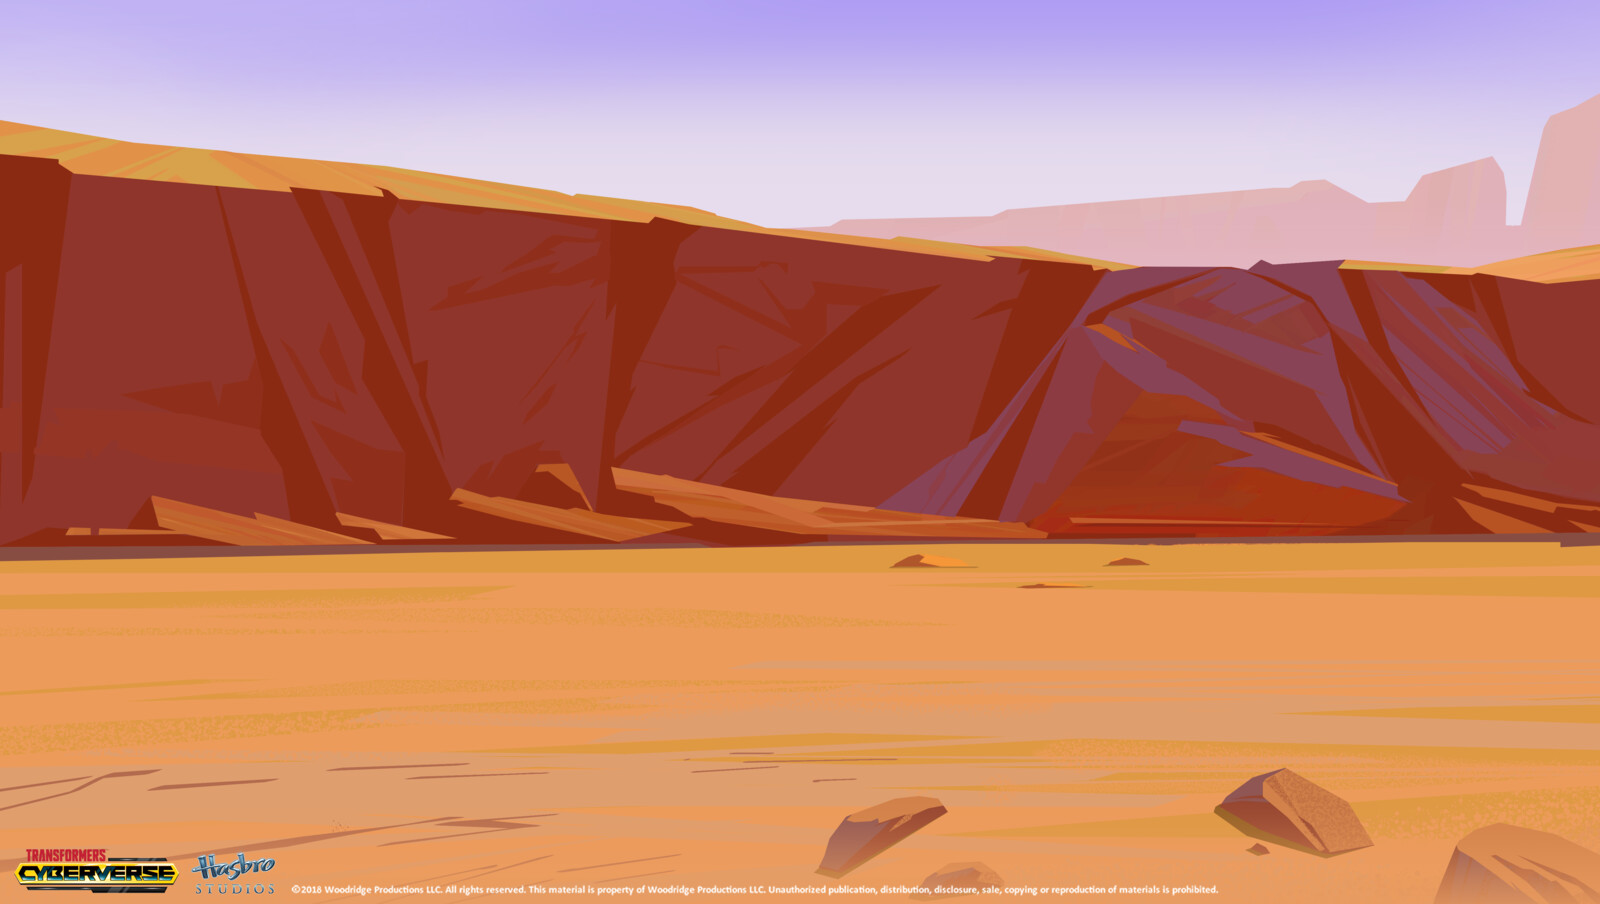 Key background based on a concept by Slawek Fedorczuk. You can check more of Slawek's works here: www.artstation.com/slawekfedorczuk